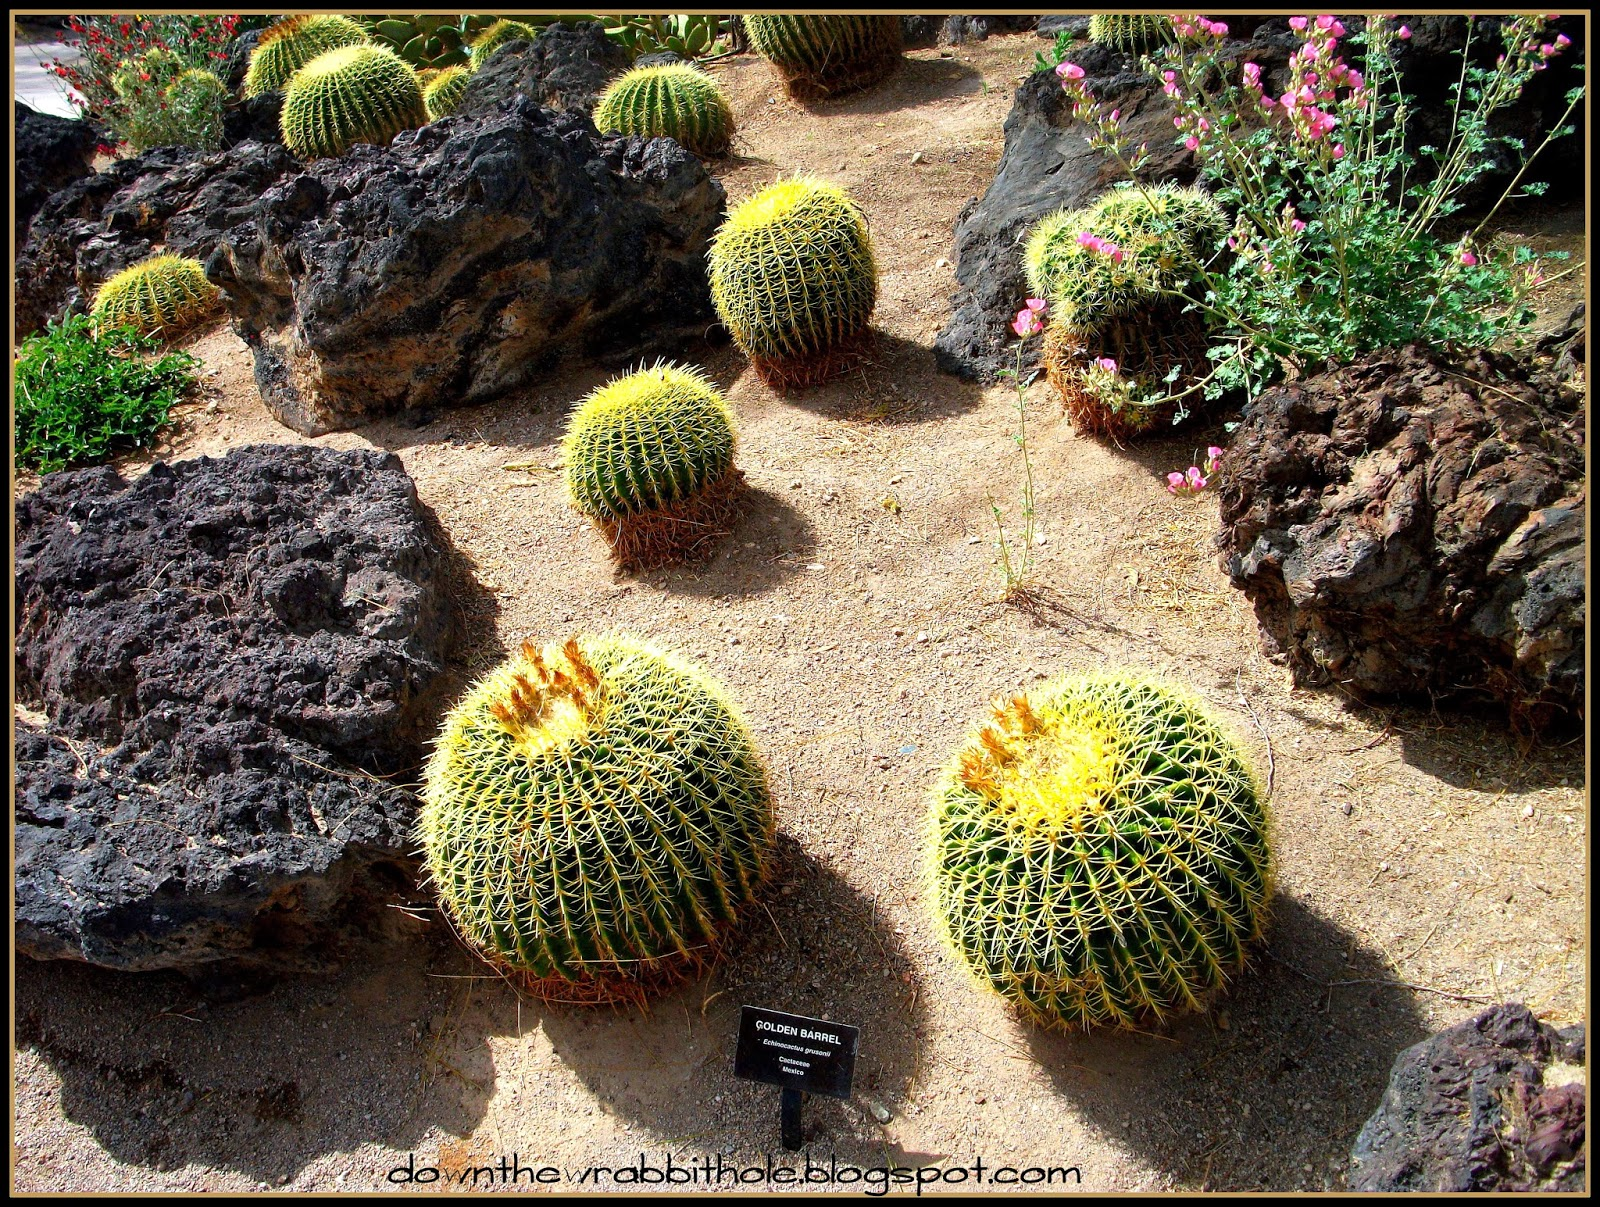 Some Pumpkin Shaped Cacti In Ethel Mu0027s Botanical Garden!